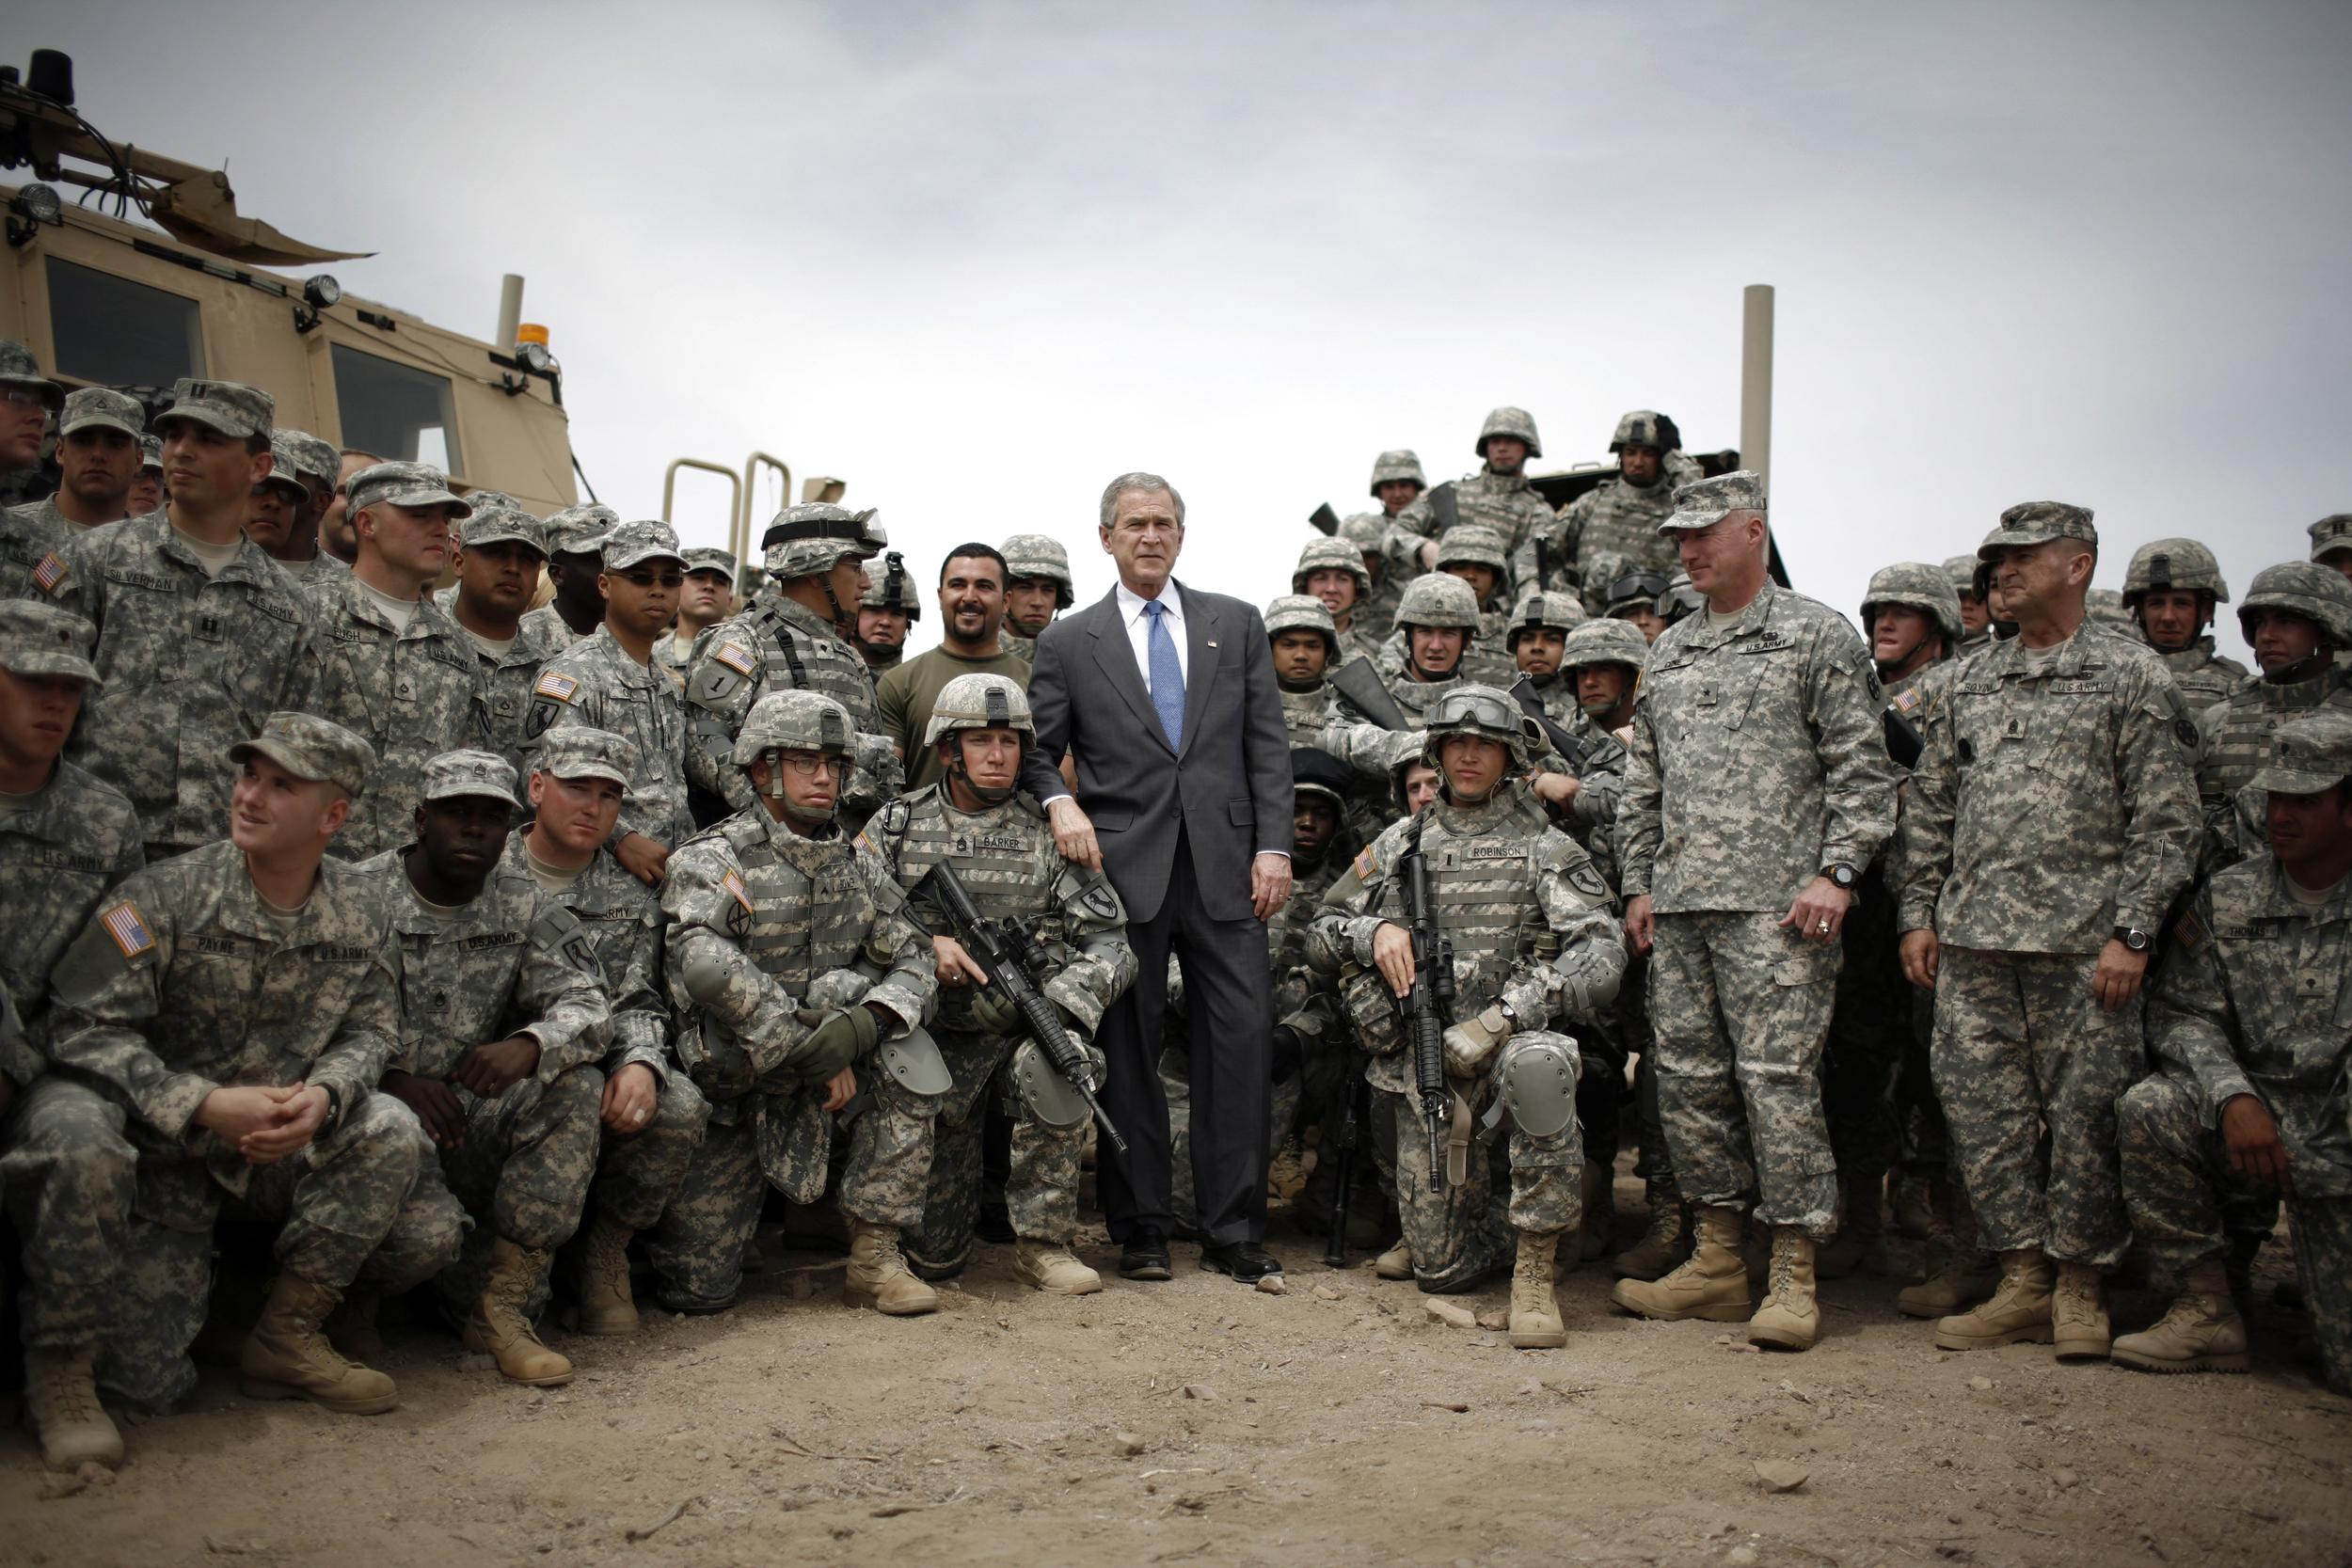 The enraging historical revisionism of America's Afghan war cheerleaders